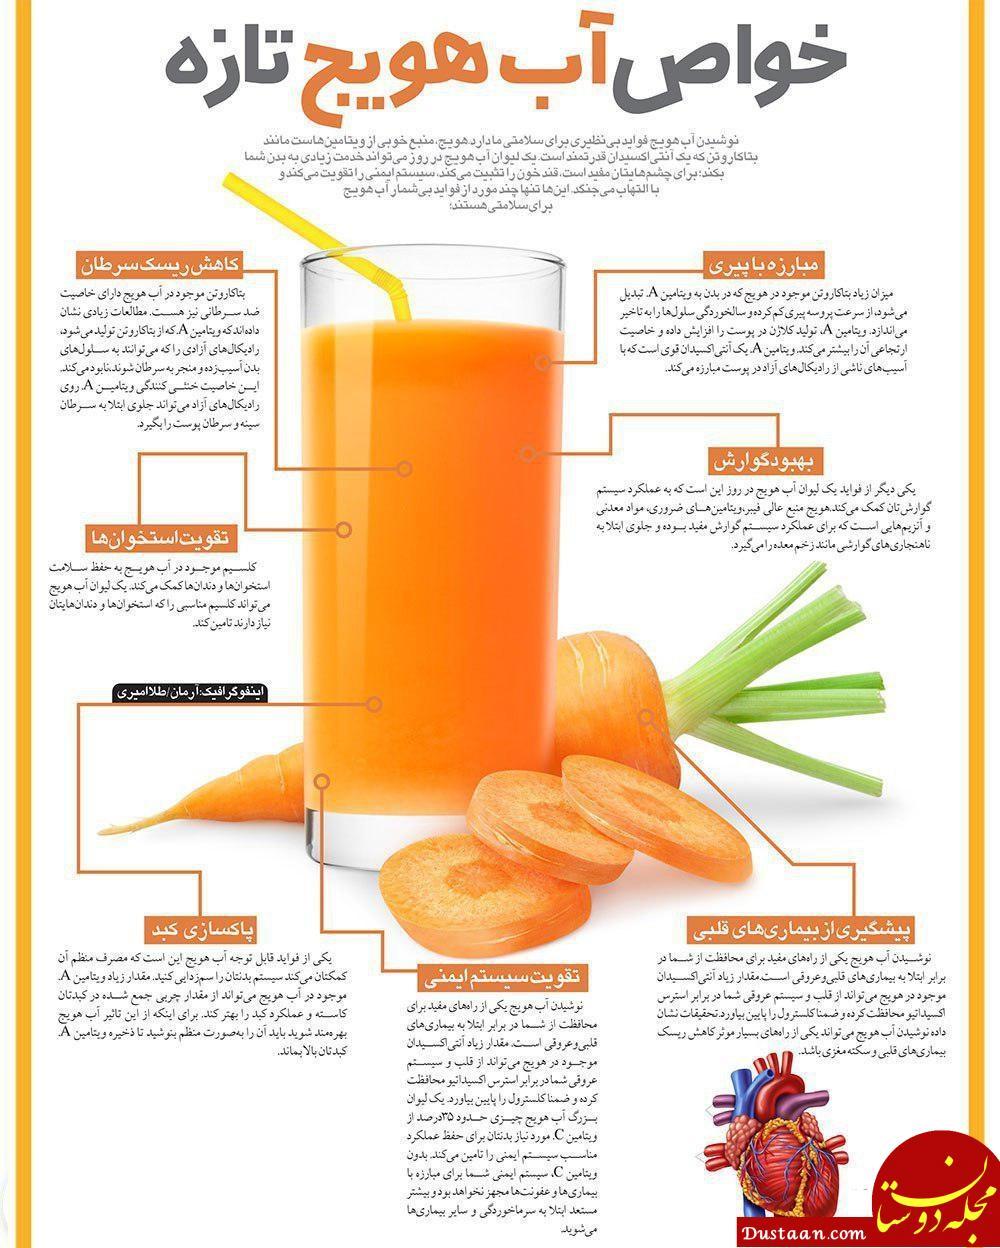 www.dustaan.com خواص و فواید دارویی آب هویج تازه